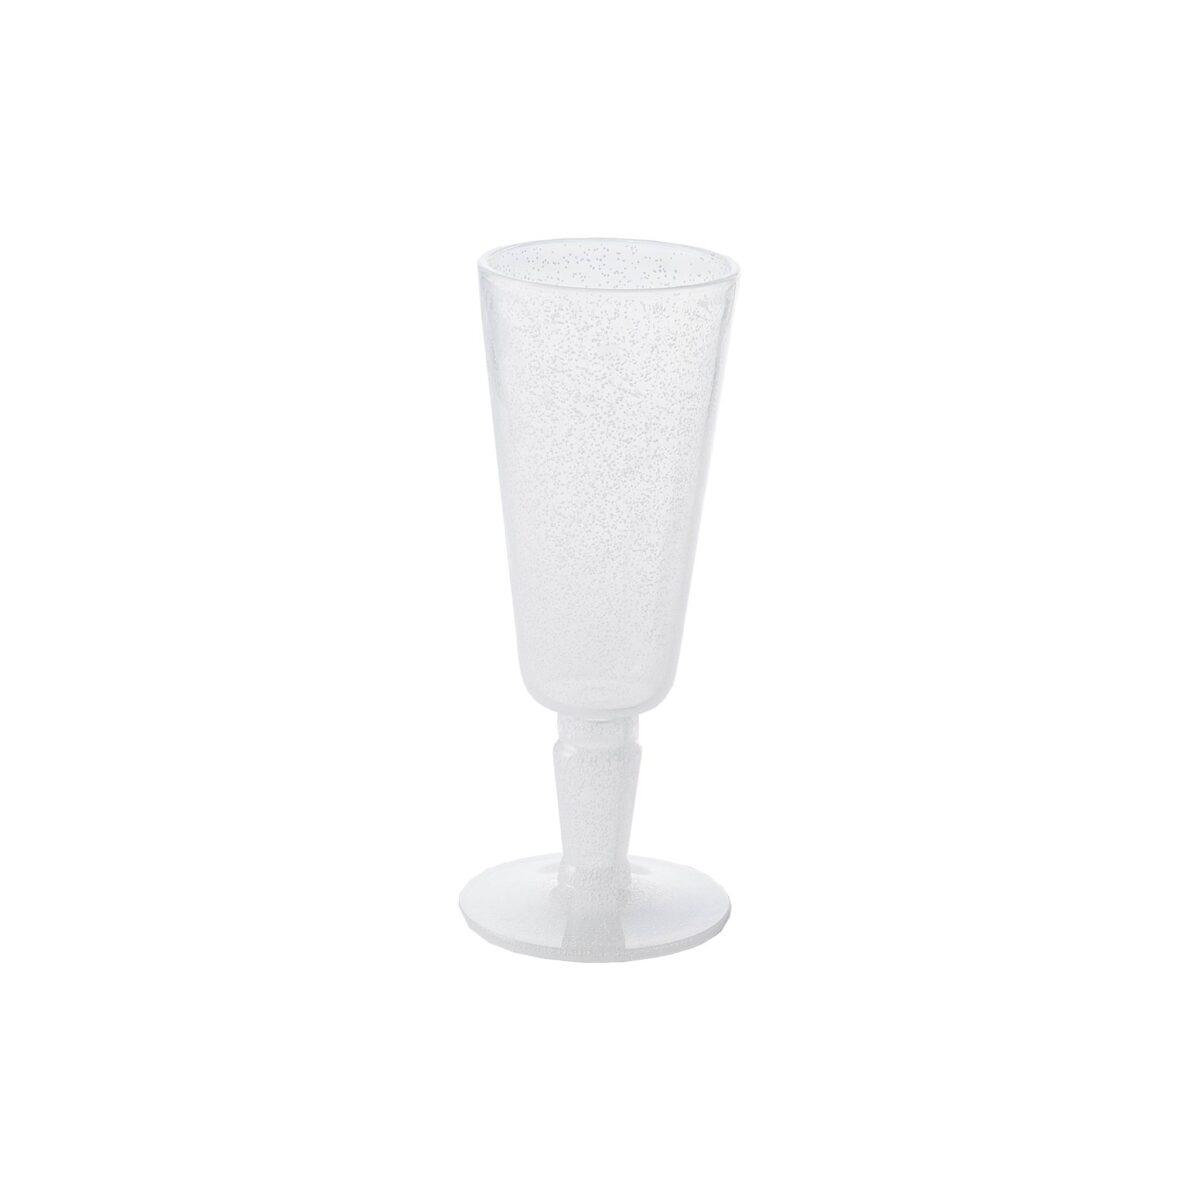 Flute - White Transparent